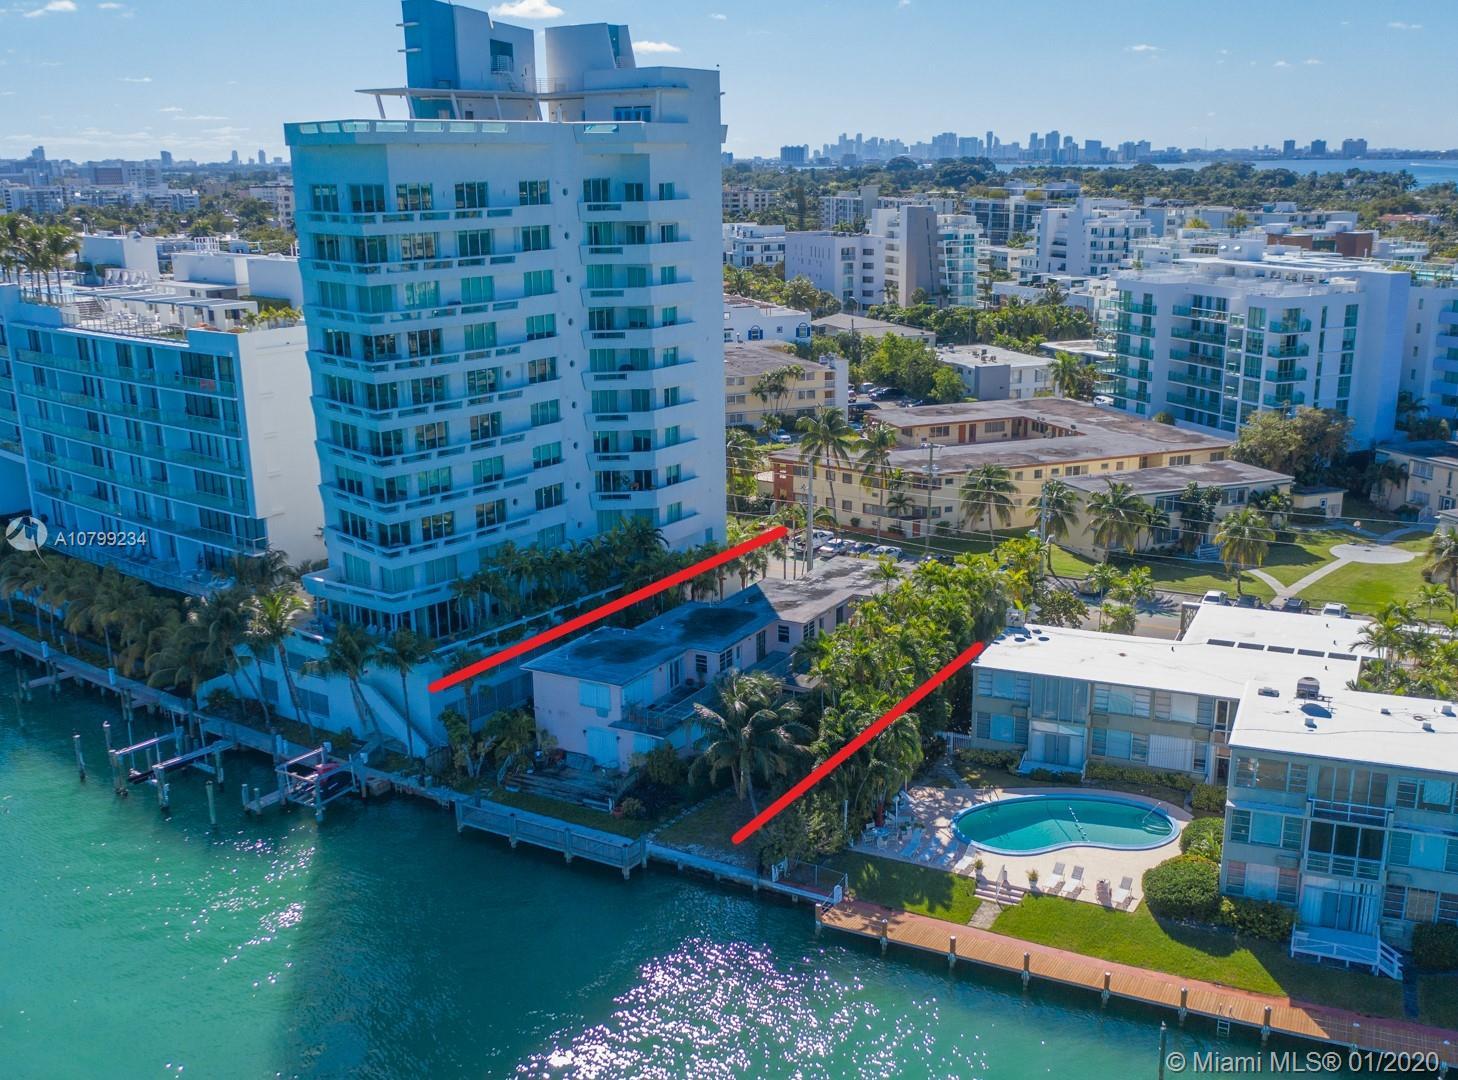 10271 E Bay Harbor Dr Property Photo - Bay Harbor Islands, FL real estate listing